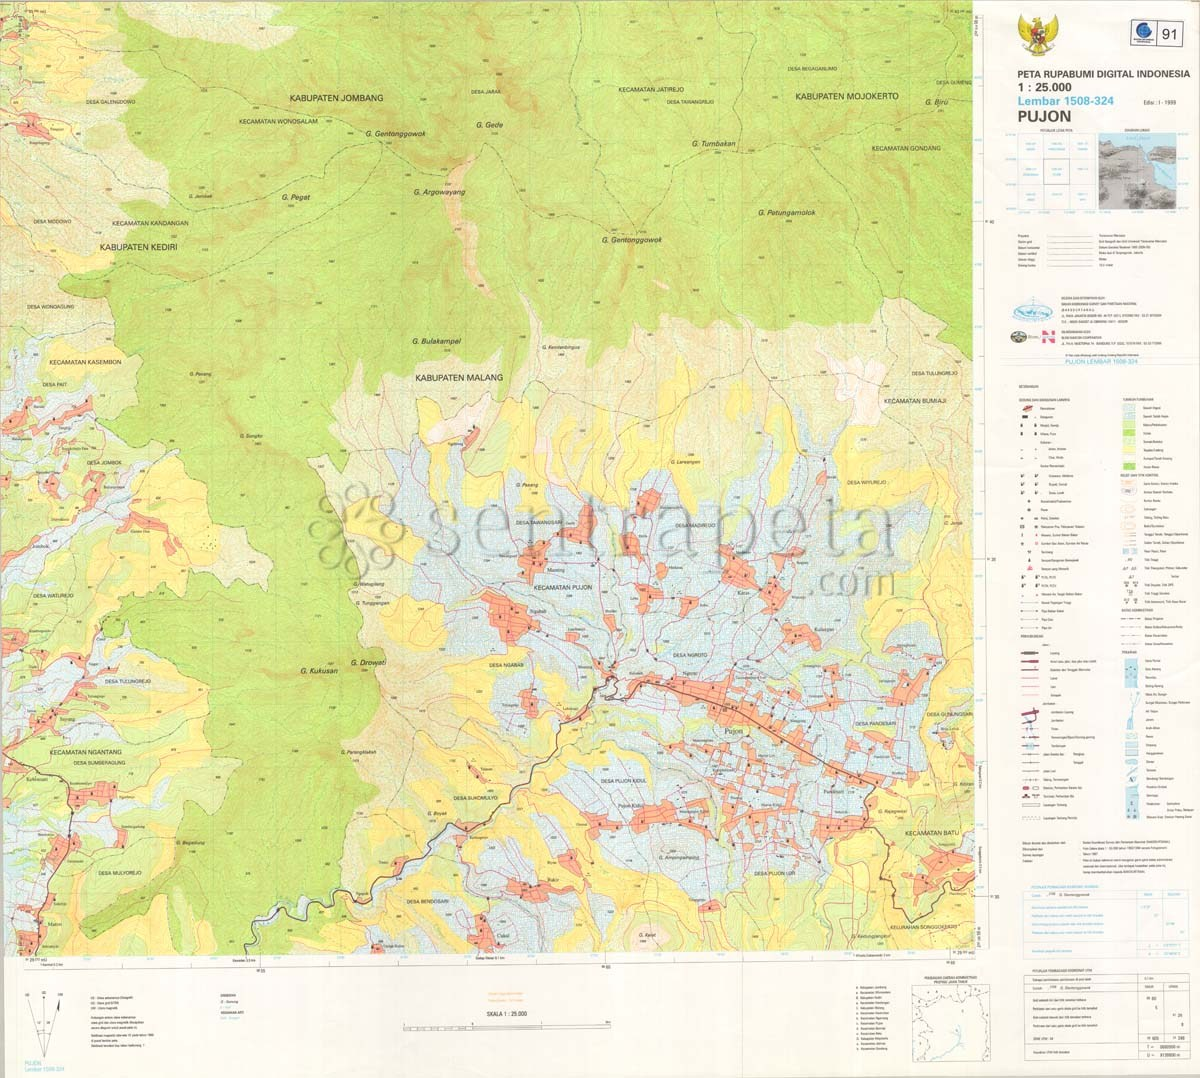 Peta Indonesia: Peta Rbi Kota Malang